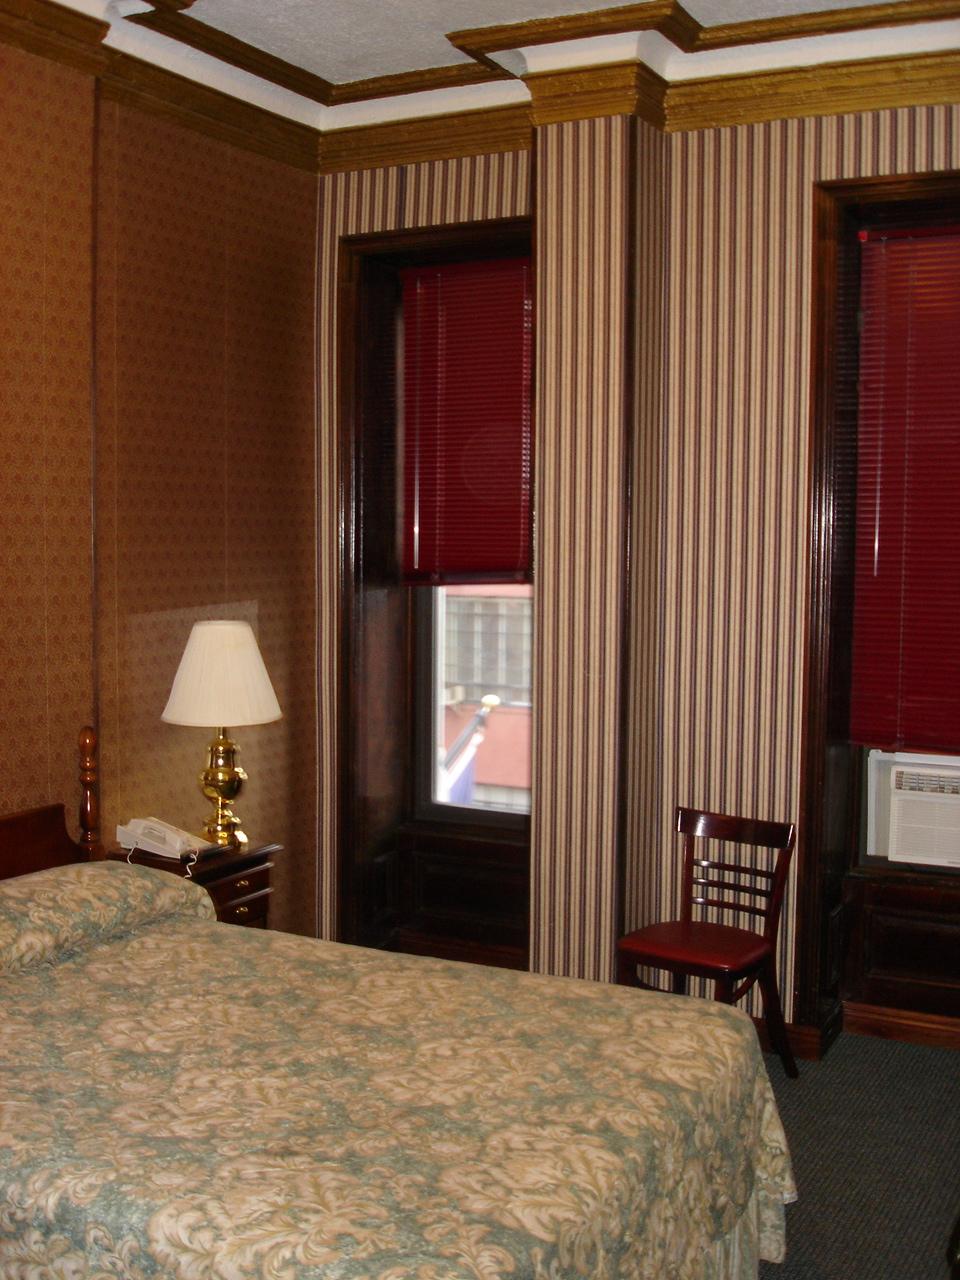 HOTEL 31-312-06.JPG